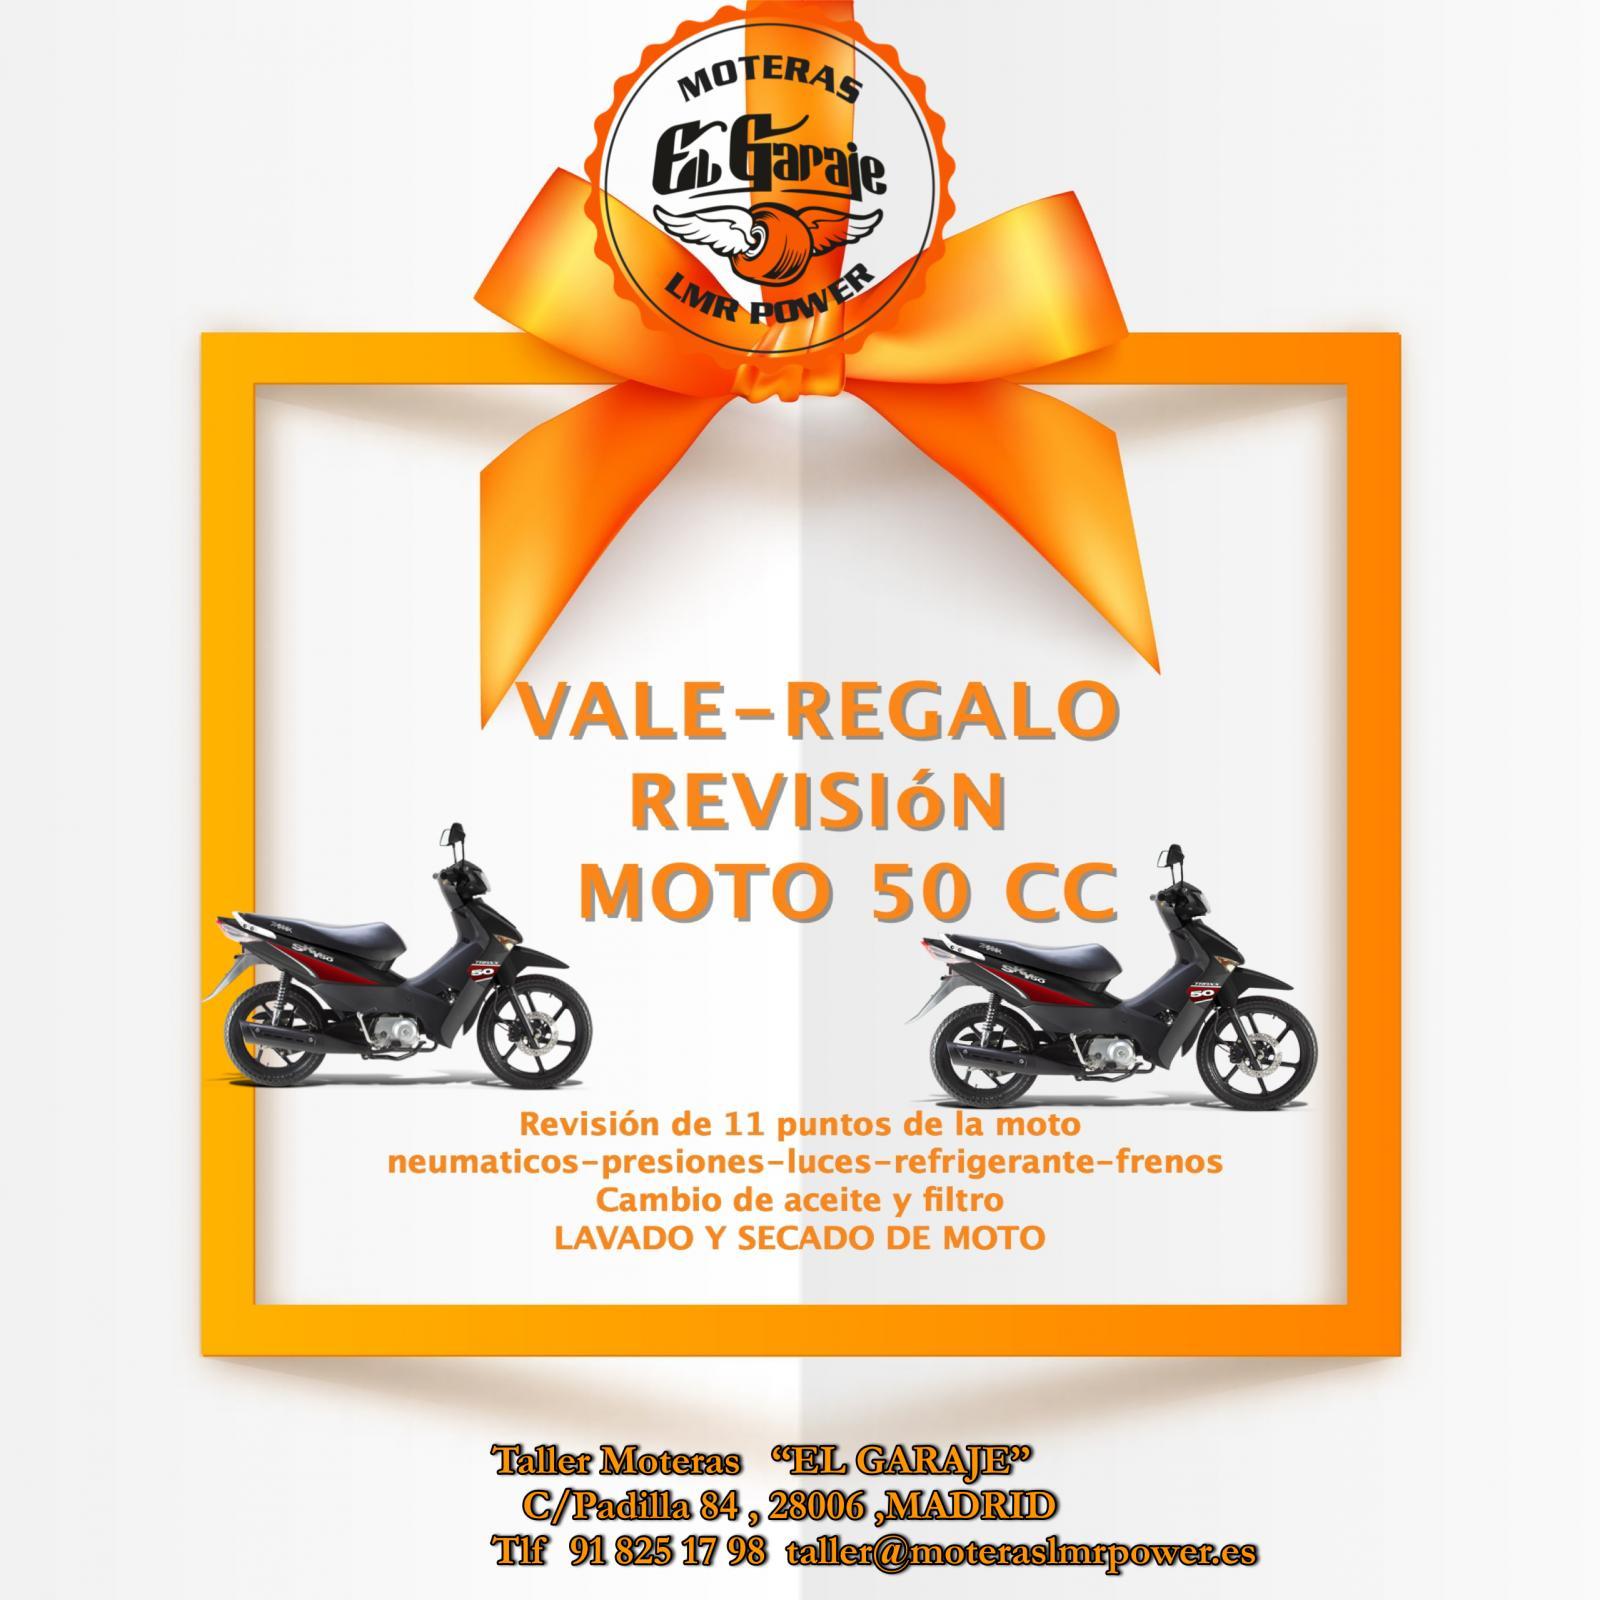 VALE REGALO REVISION COMPLETA PARA MOTOS DE 50CC